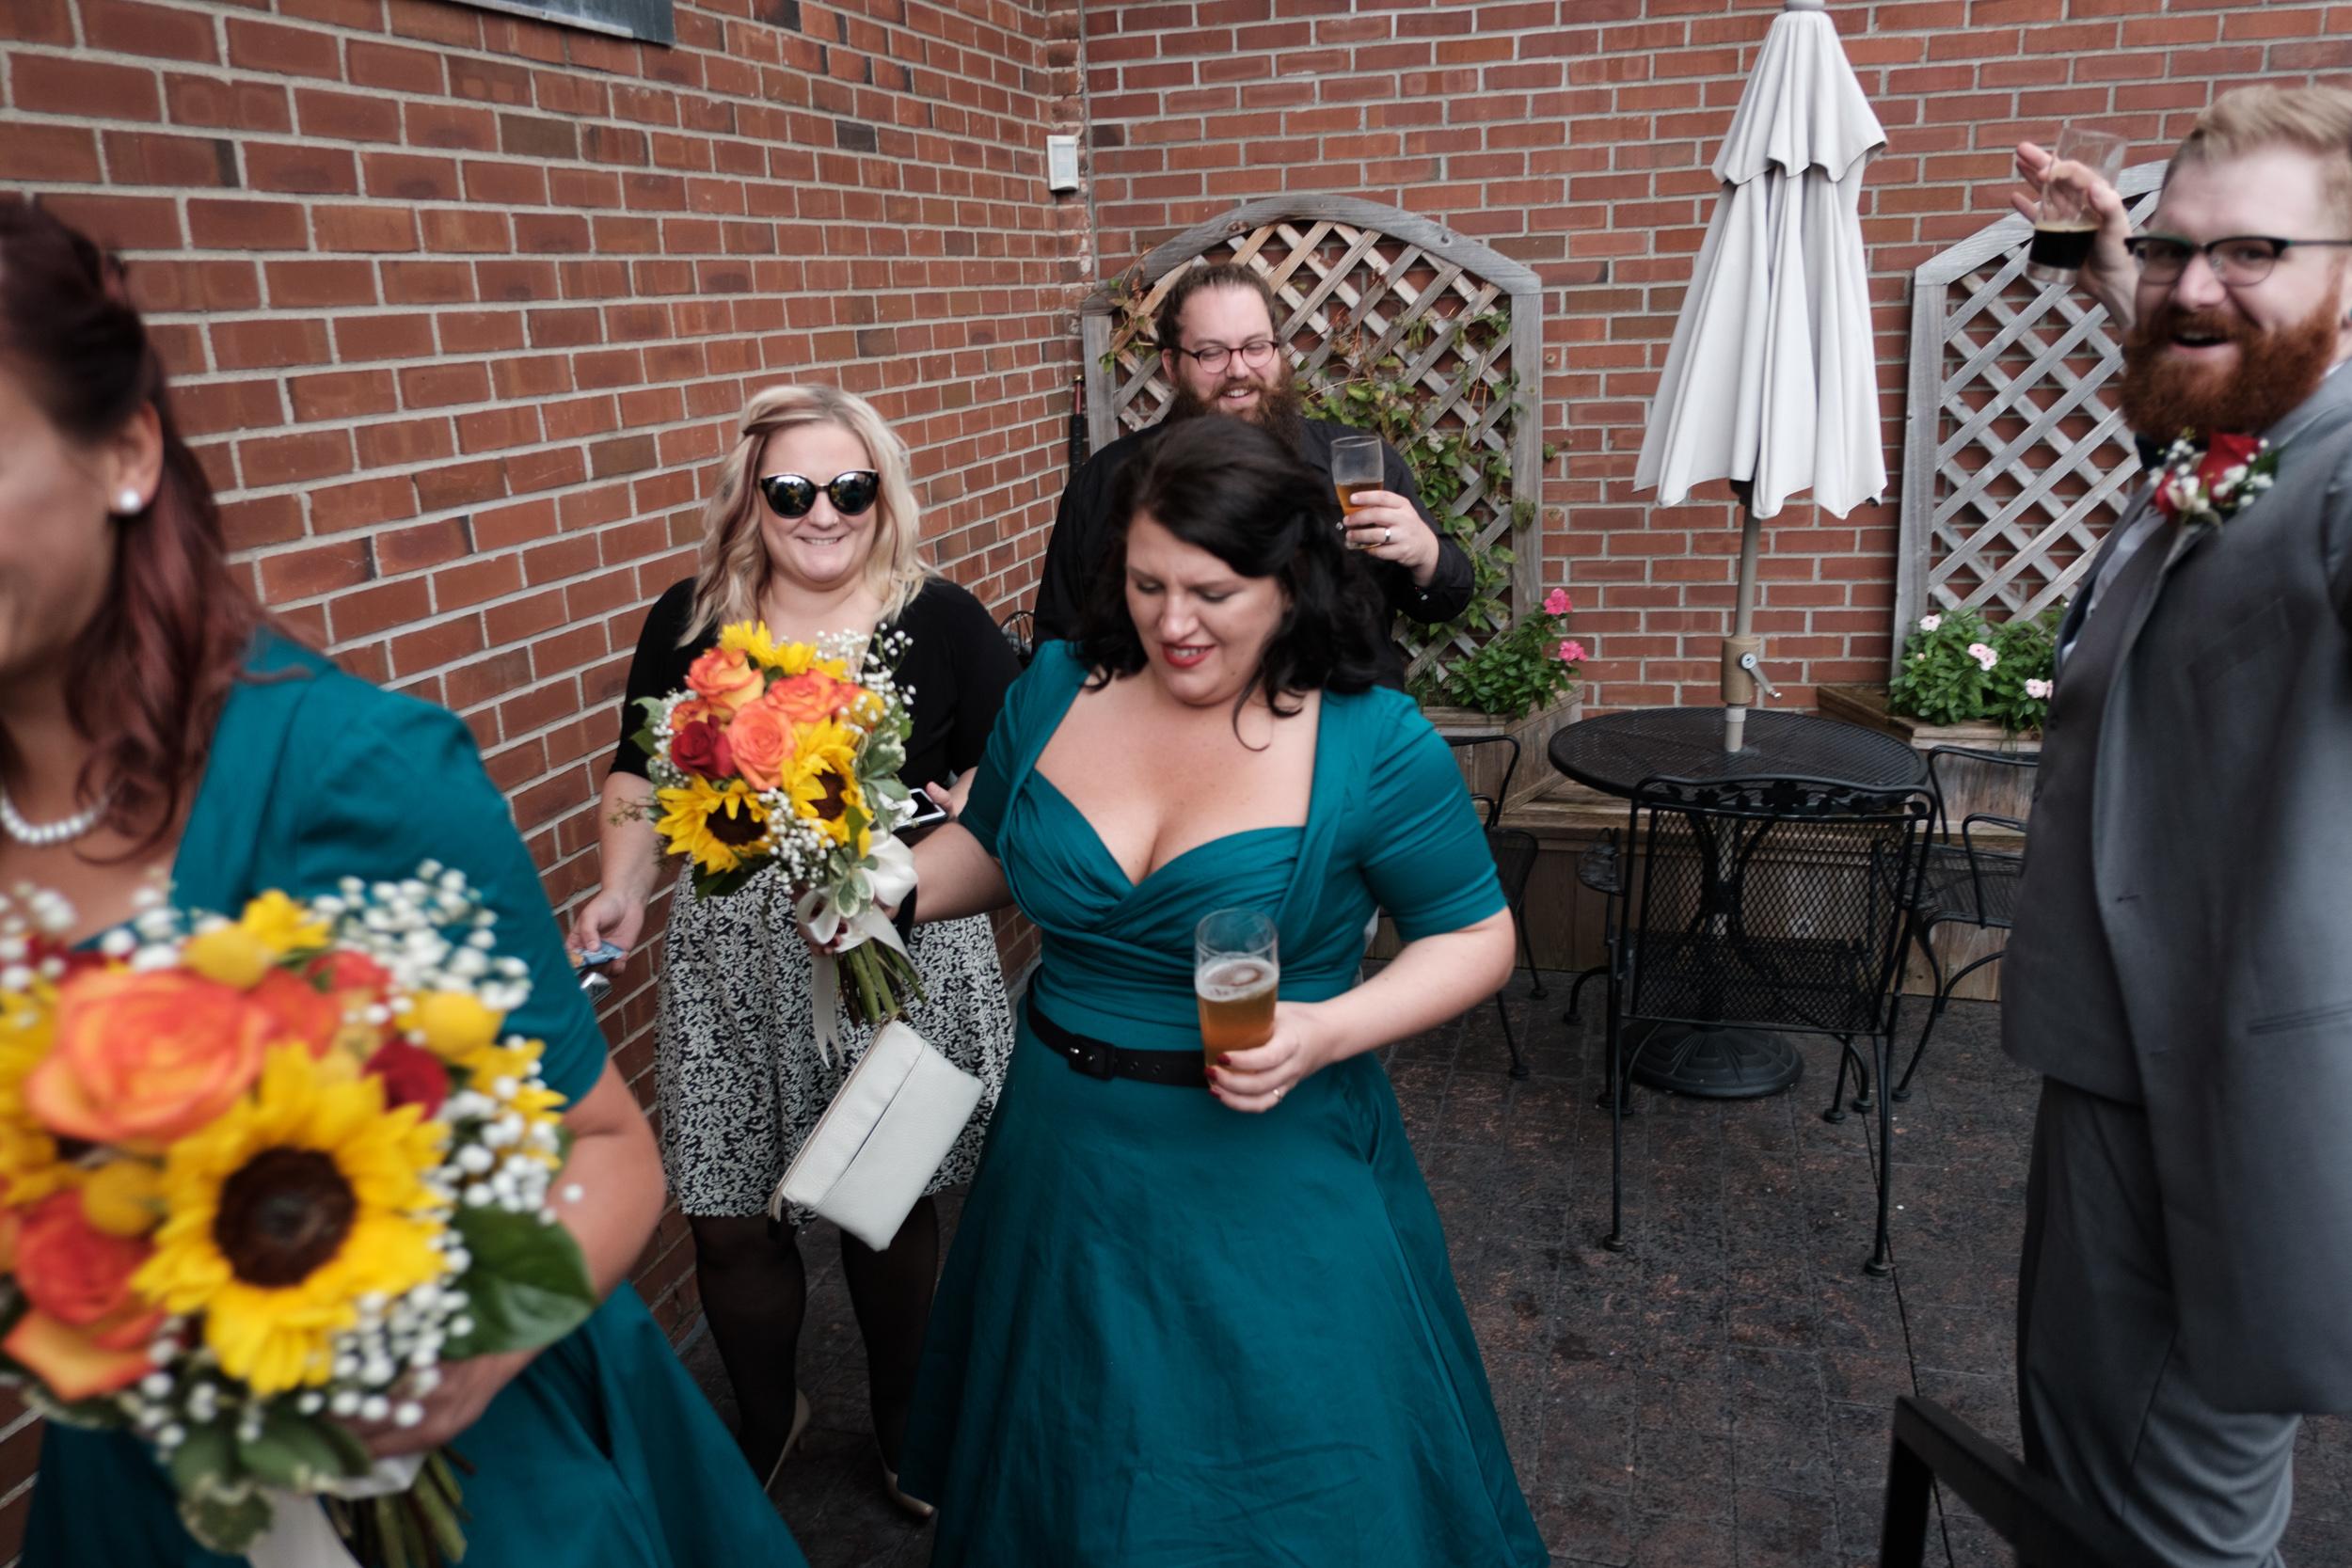 Christian & Sarah wedding photography by Brian milo-205.jpg